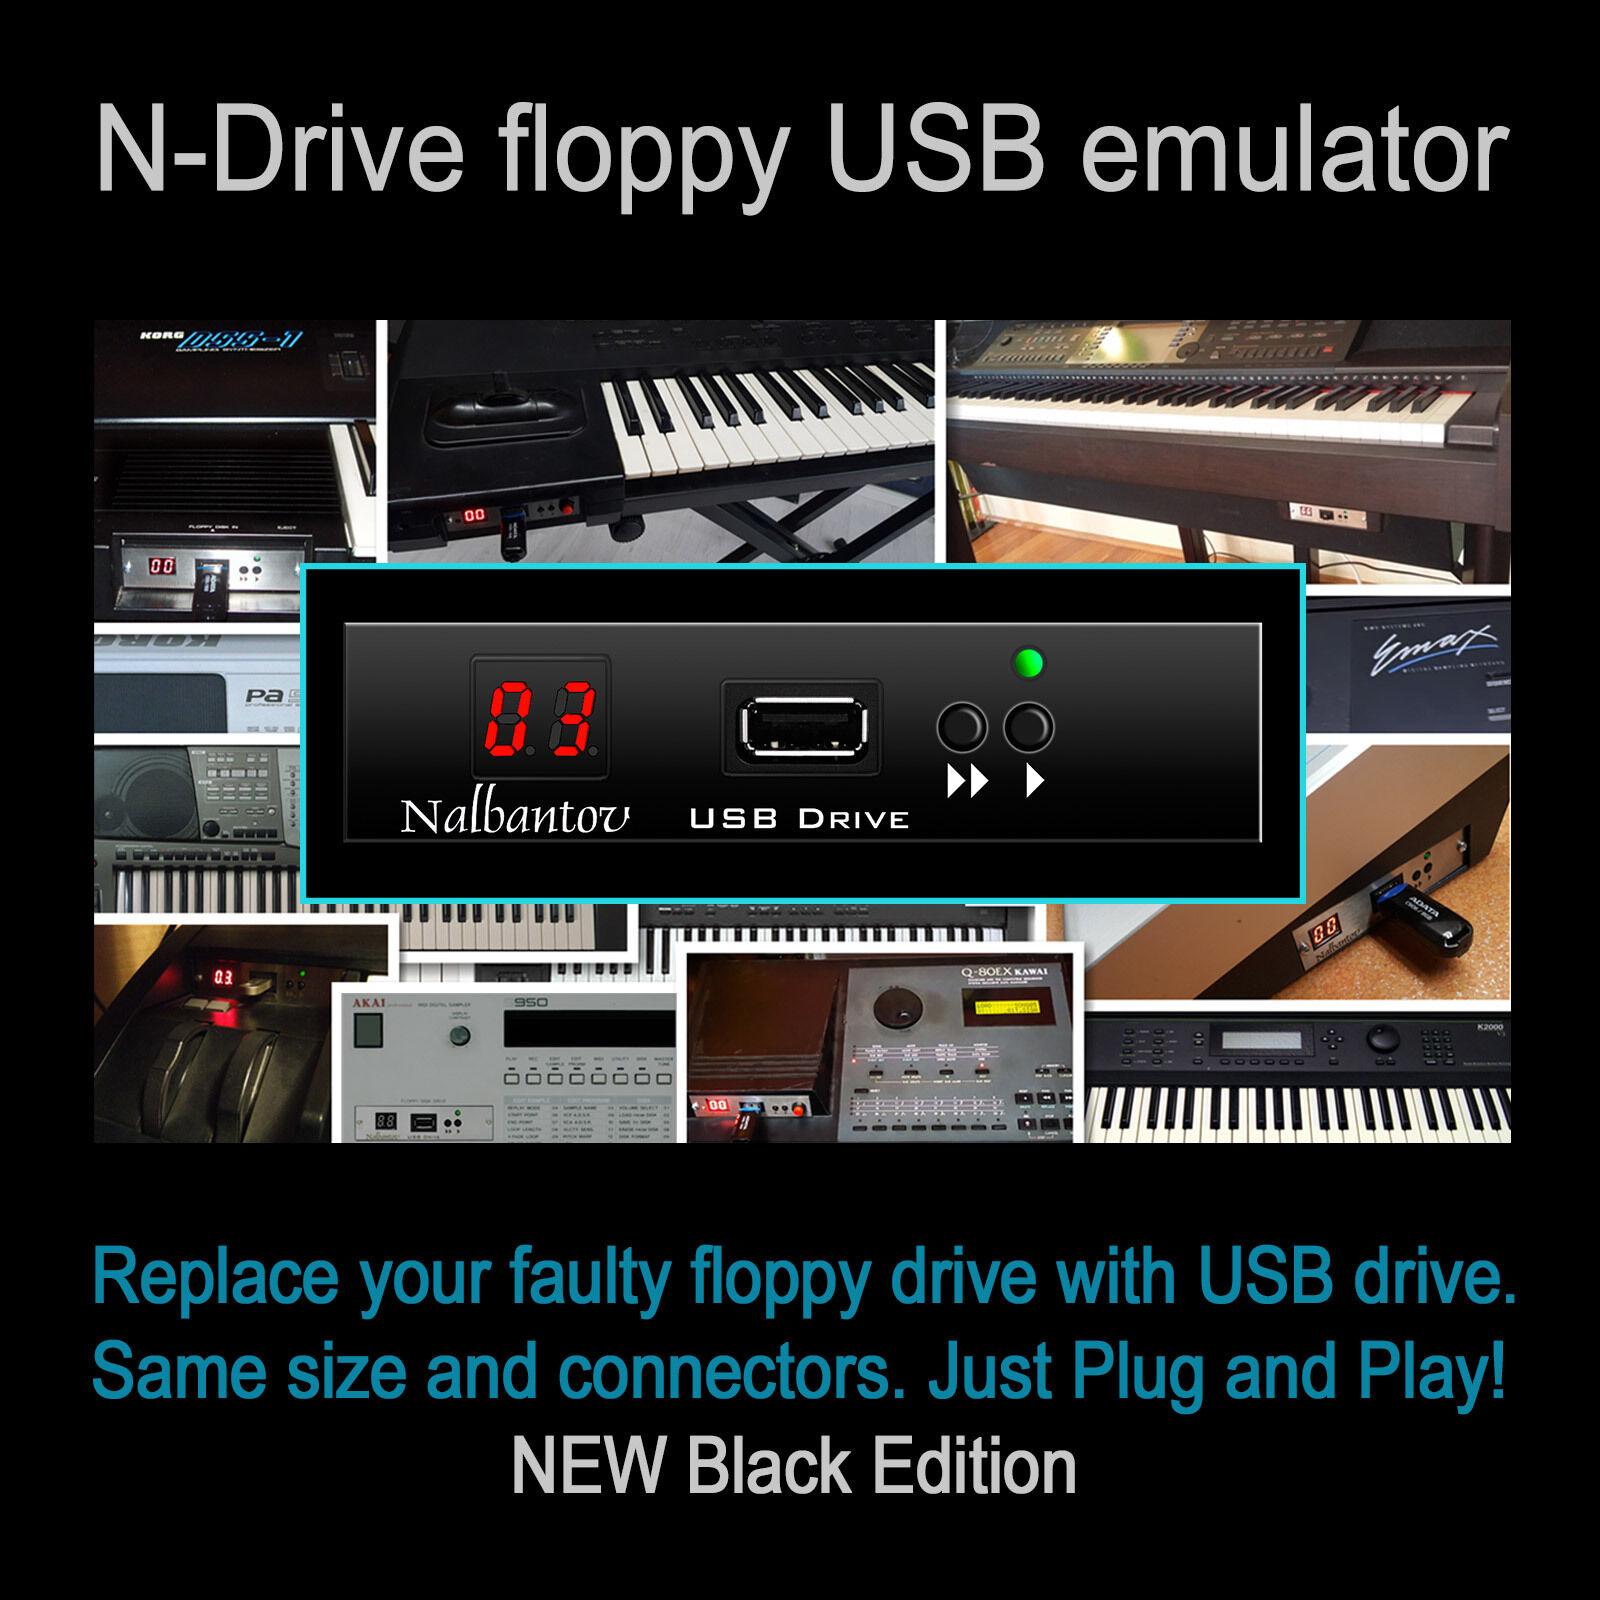 USB Floppy Drive Emulator N-Drive 100 for Roland E500 XP60 XP80 EM2000 MT300